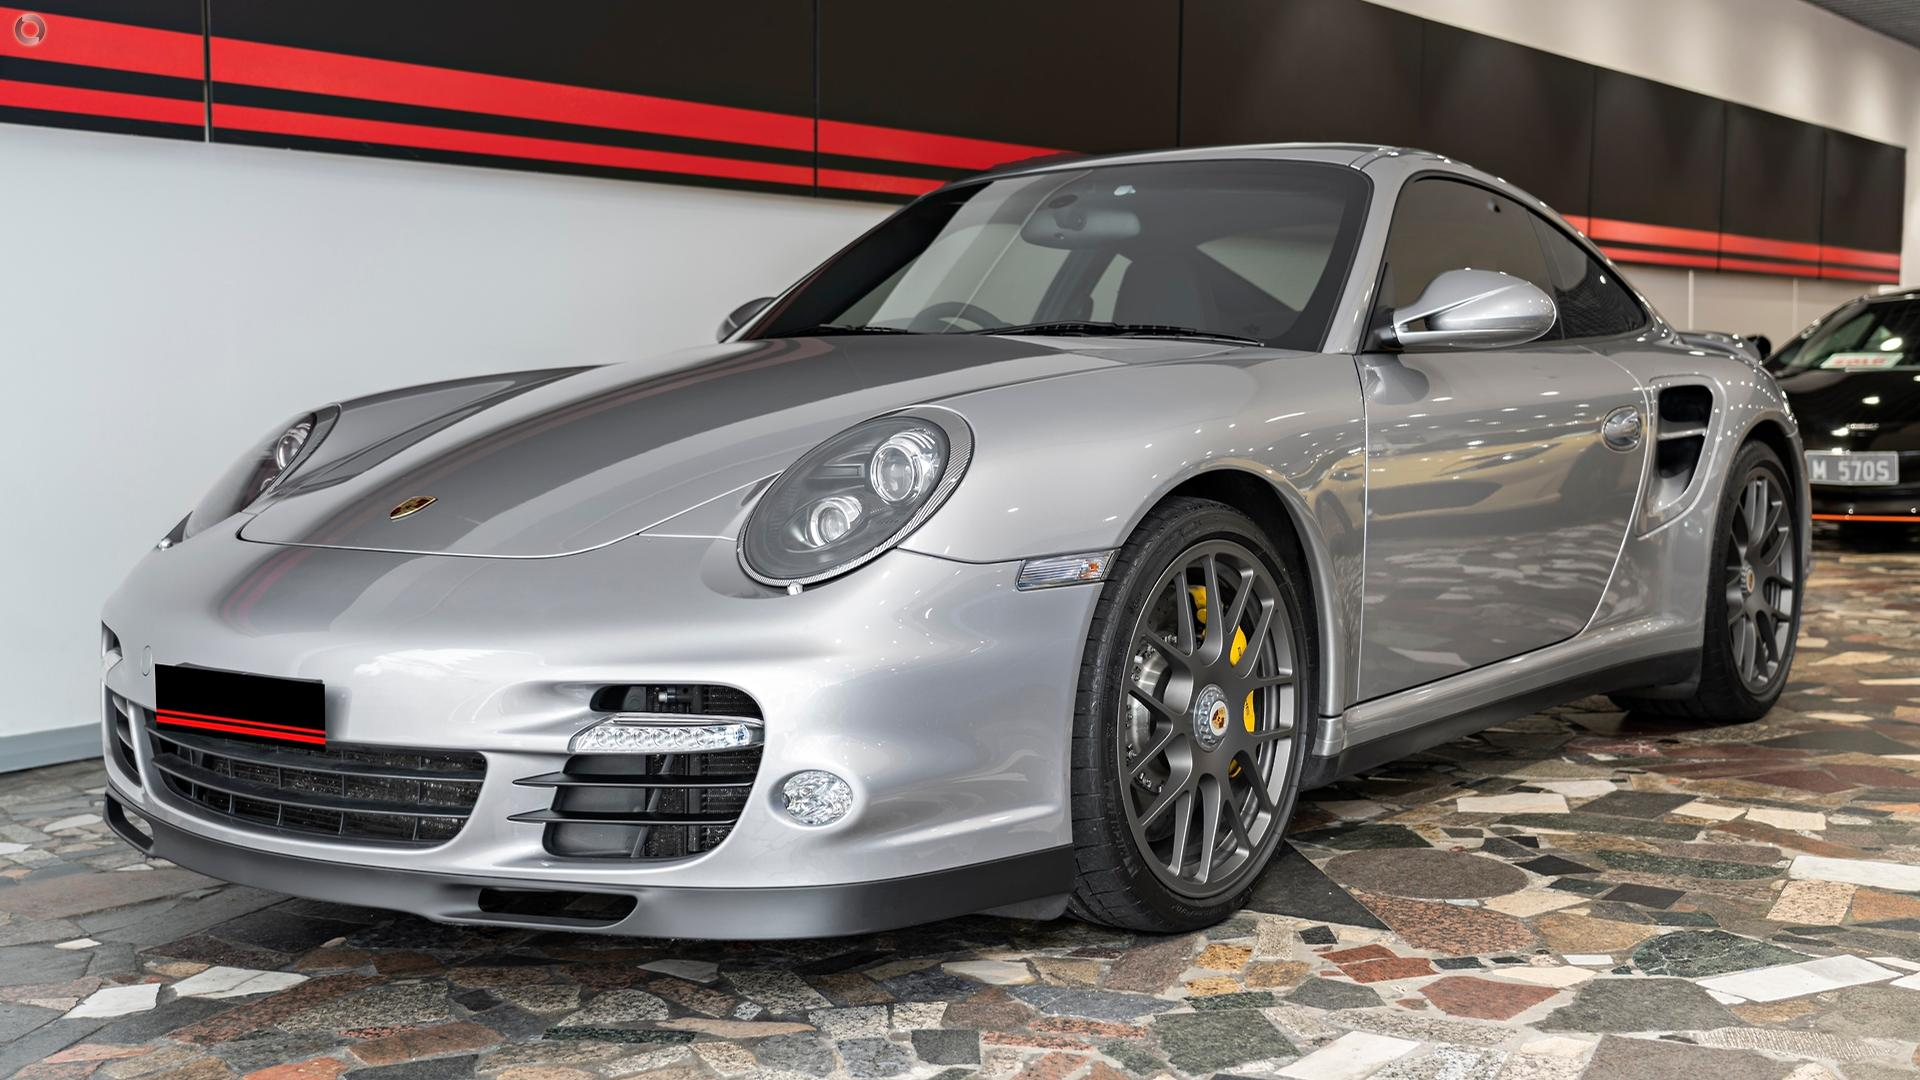 2010 Porsche 911 997 Series II